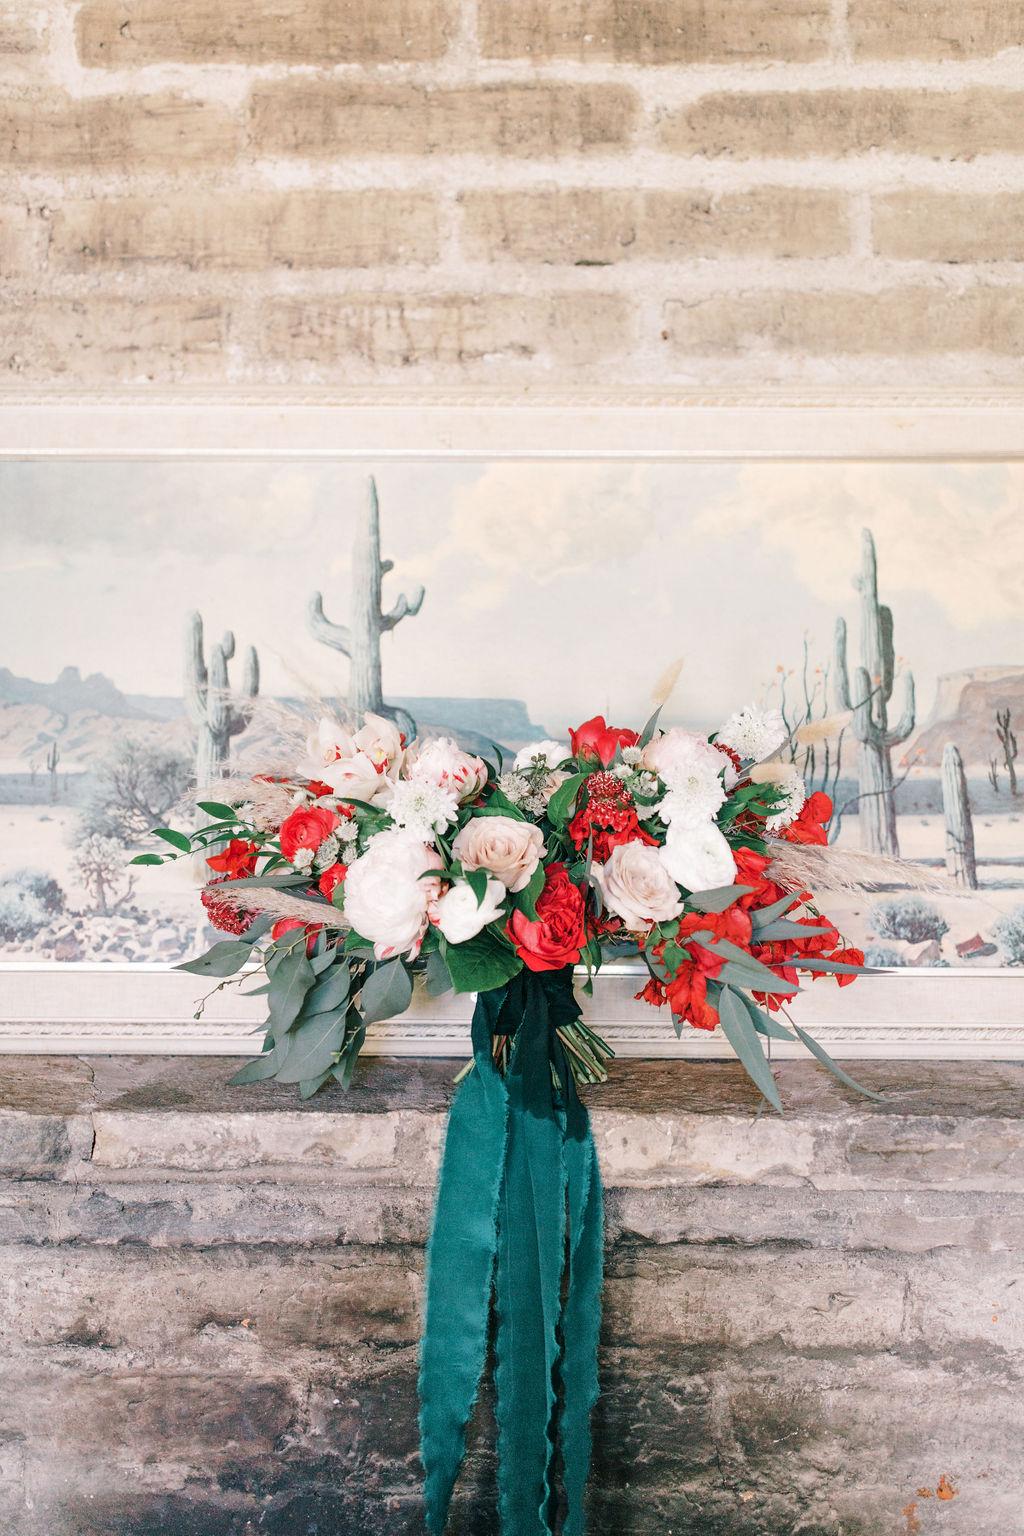 meagan robert wedding red and beige bouquet